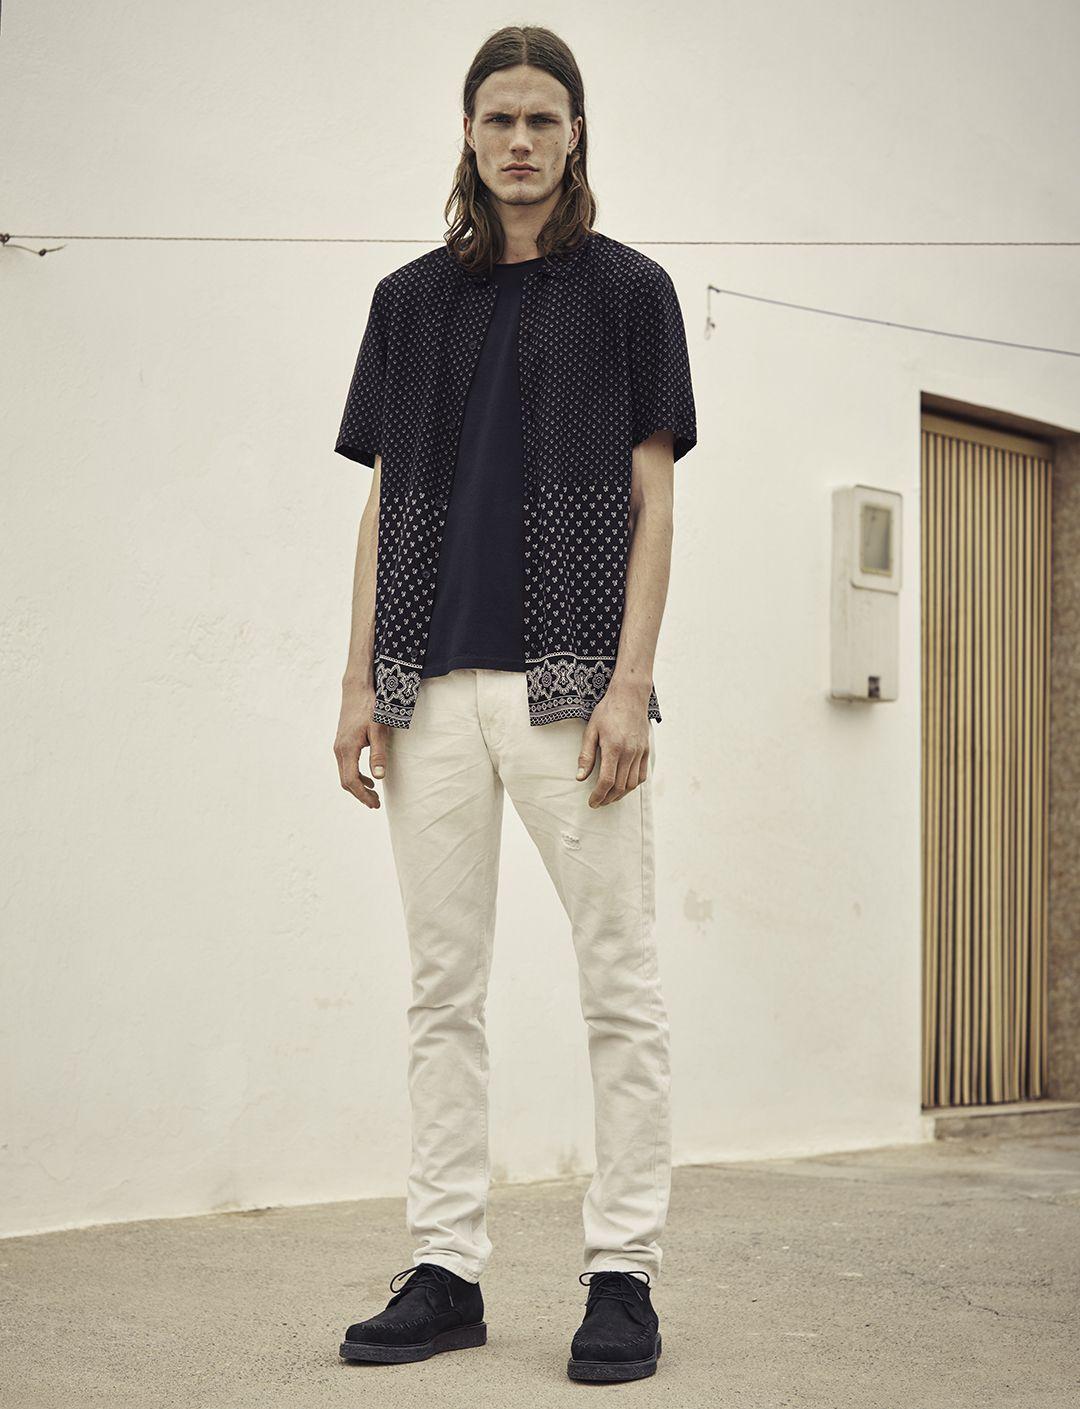 58fee119 AllSaints Men's June Lookbook Look 7: Bordure Short sleeve Shirt, Mehson  Crew T-shirt, Armstrong Pistol Jeans, Juno Boot